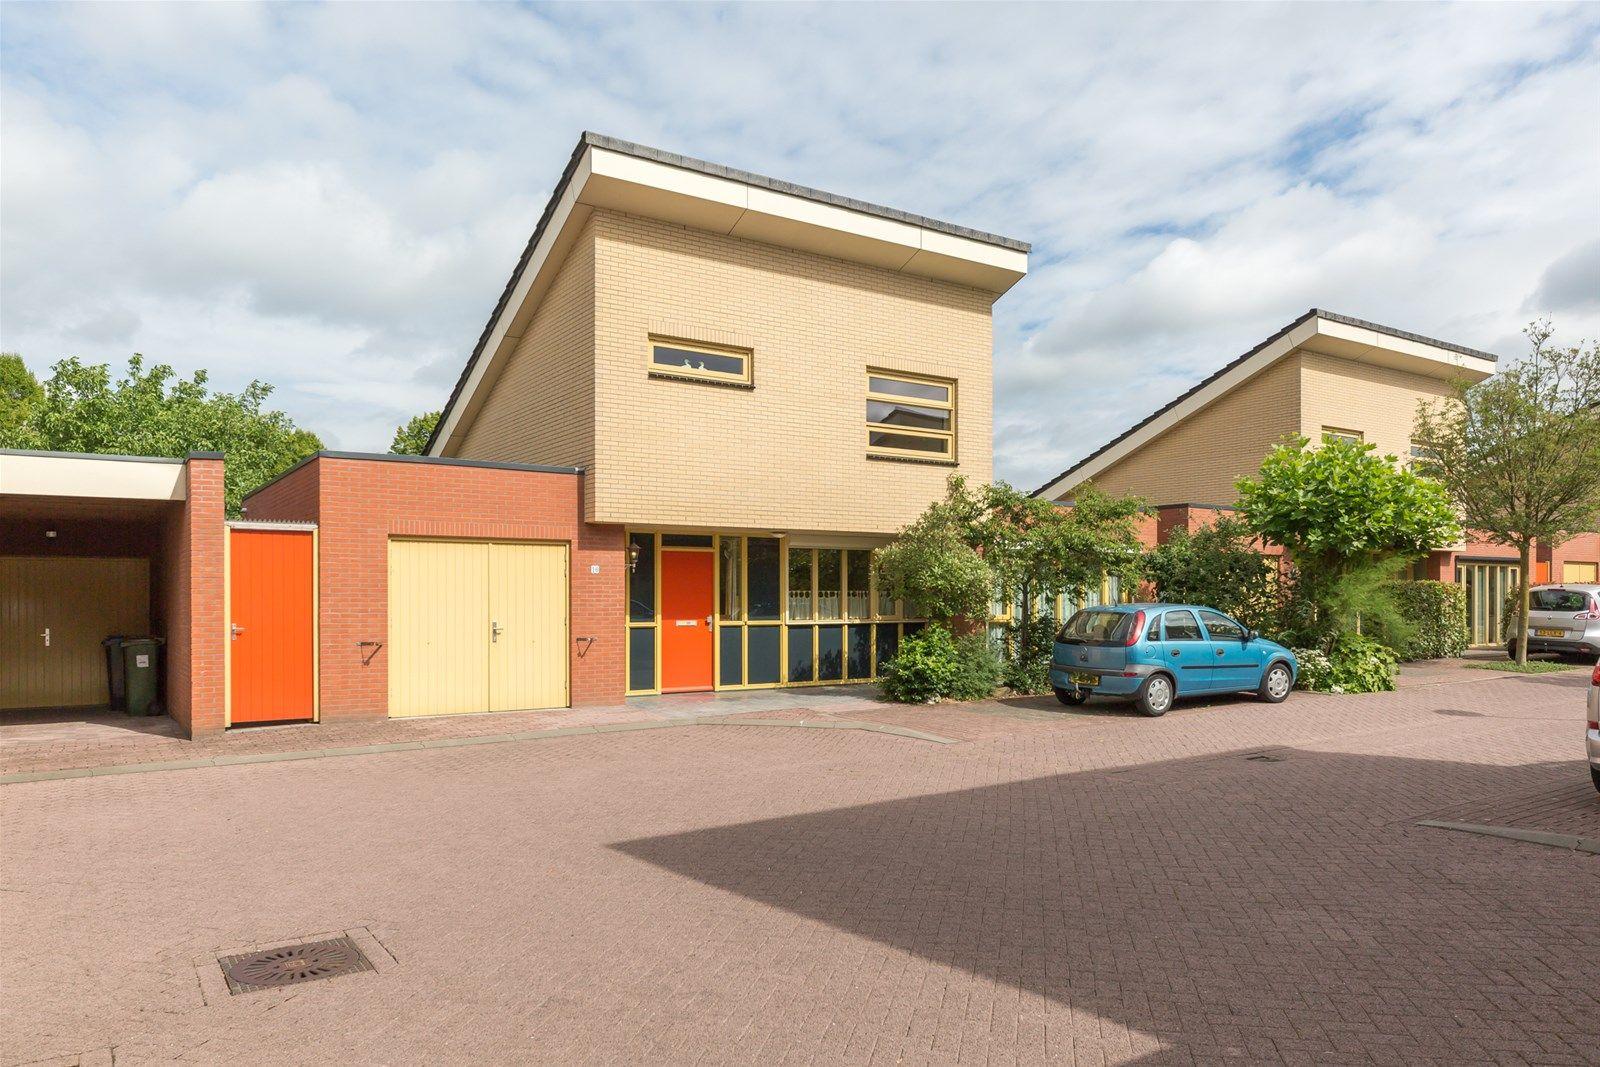 Oranjehof 10, Doetinchem